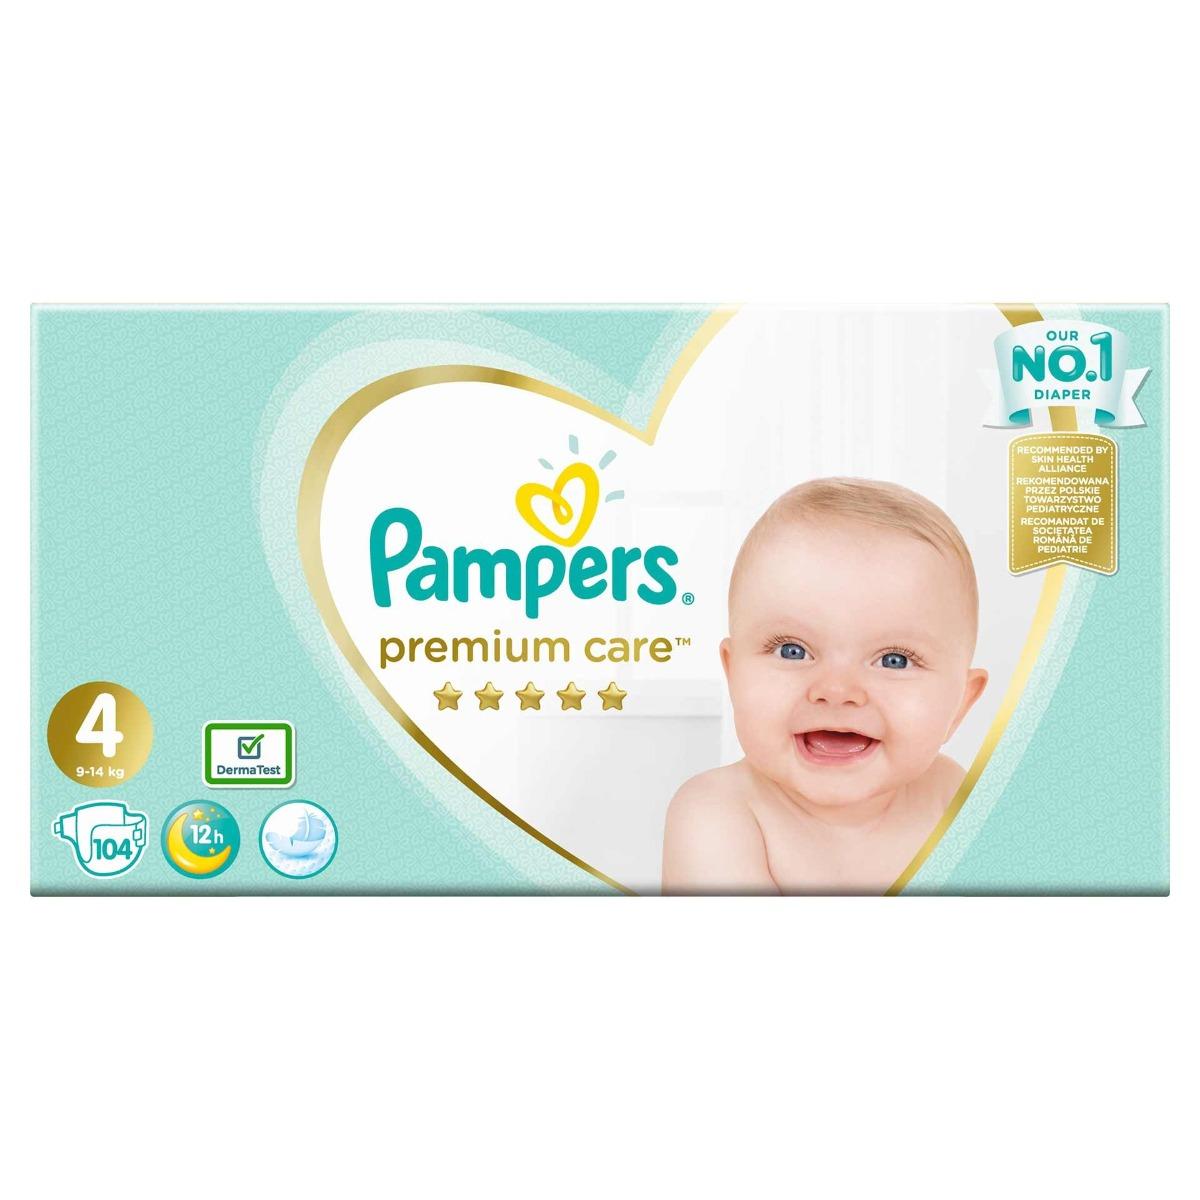 Scutece Premium Care 4, 104bucati, Pampers drmax.ro